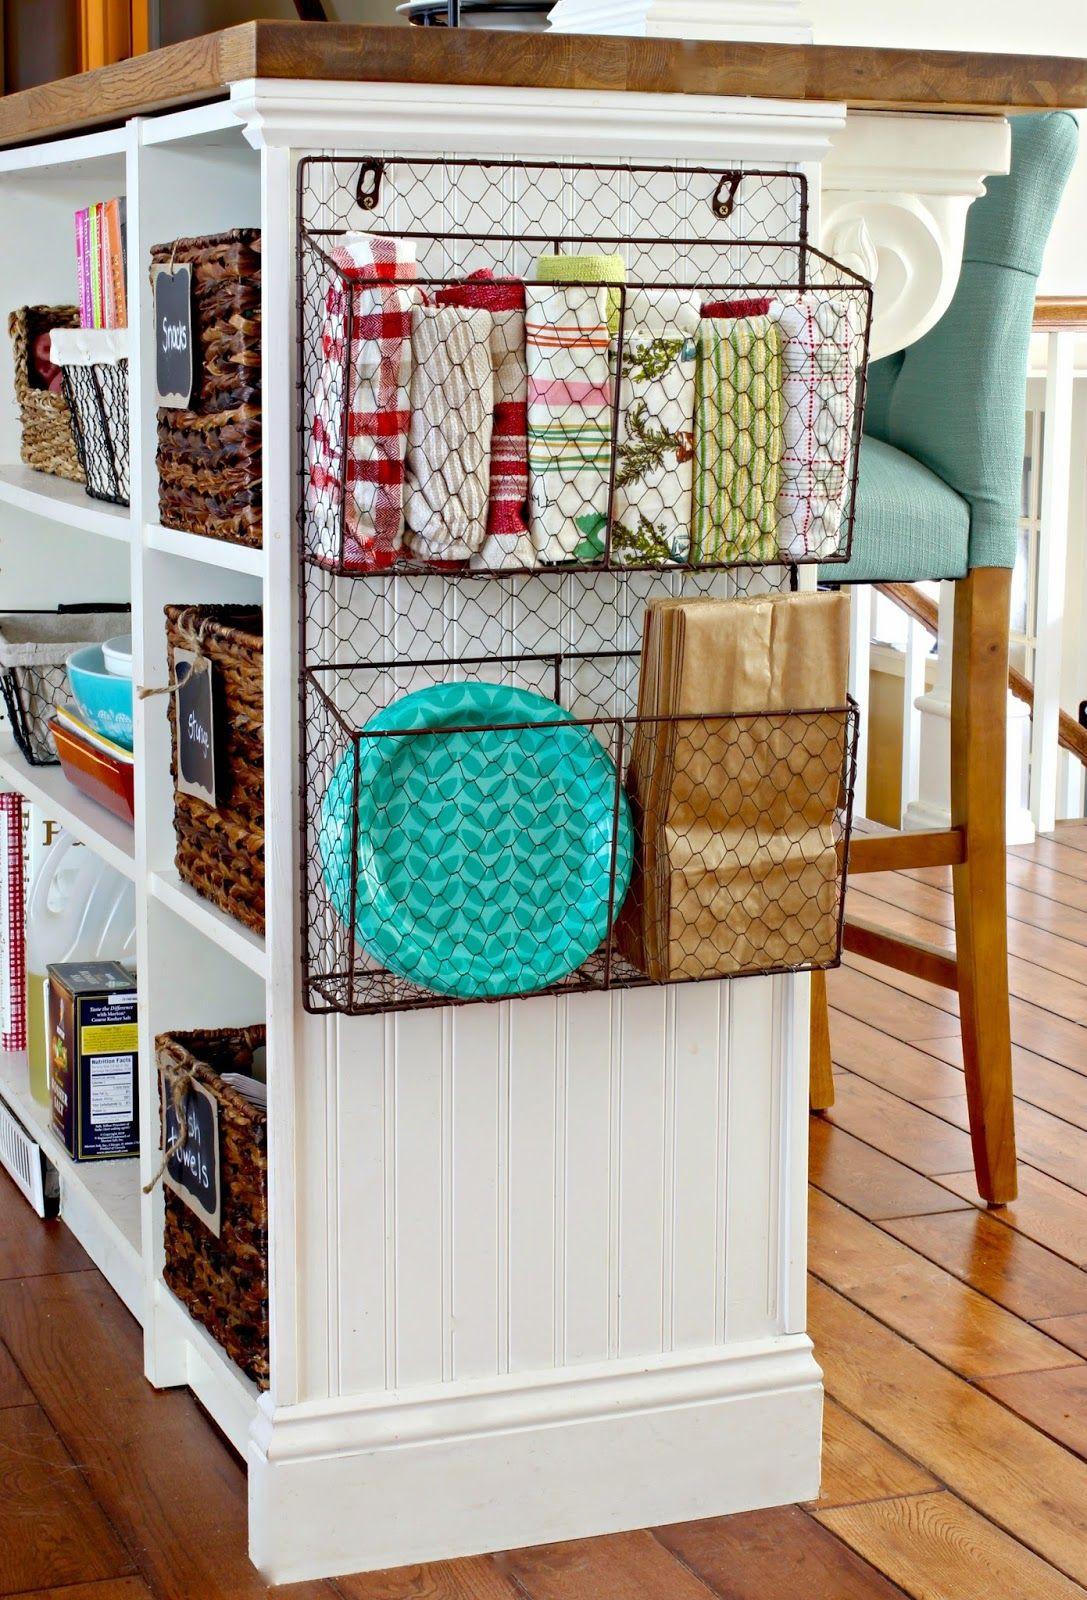 Best ideas about Diy Kitchen Ideas . Save or Pin DIY Kitchen Decor on Pinterest Now.